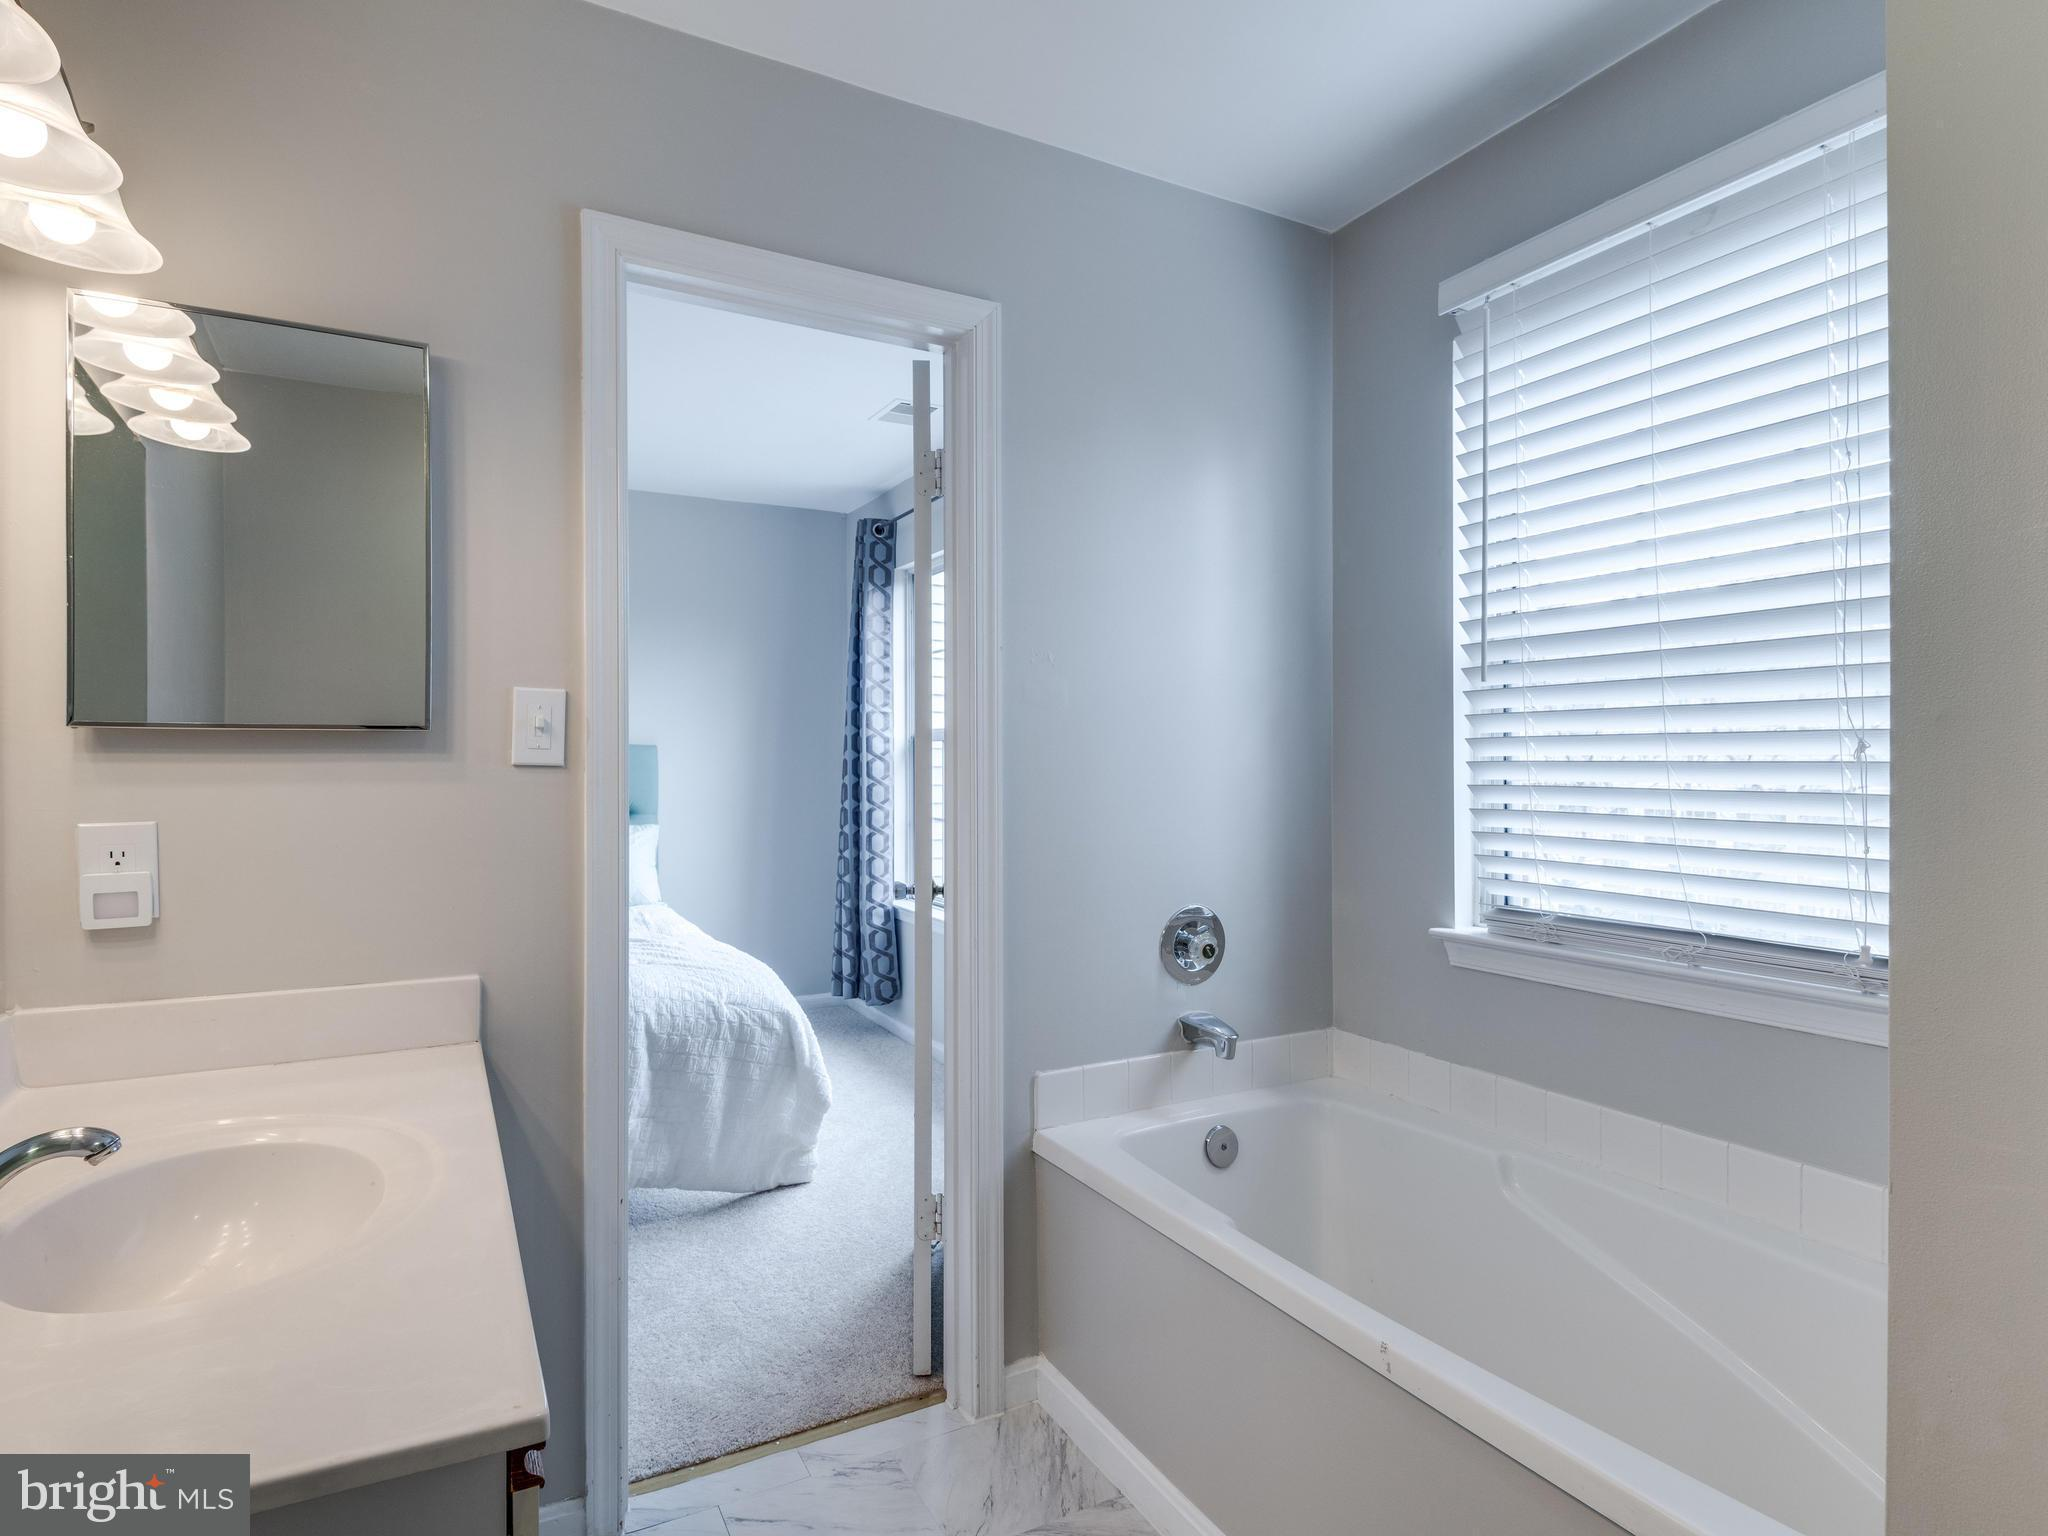 Colorful Sterling Bathroom Showers Model - Bathroom - knawi.com